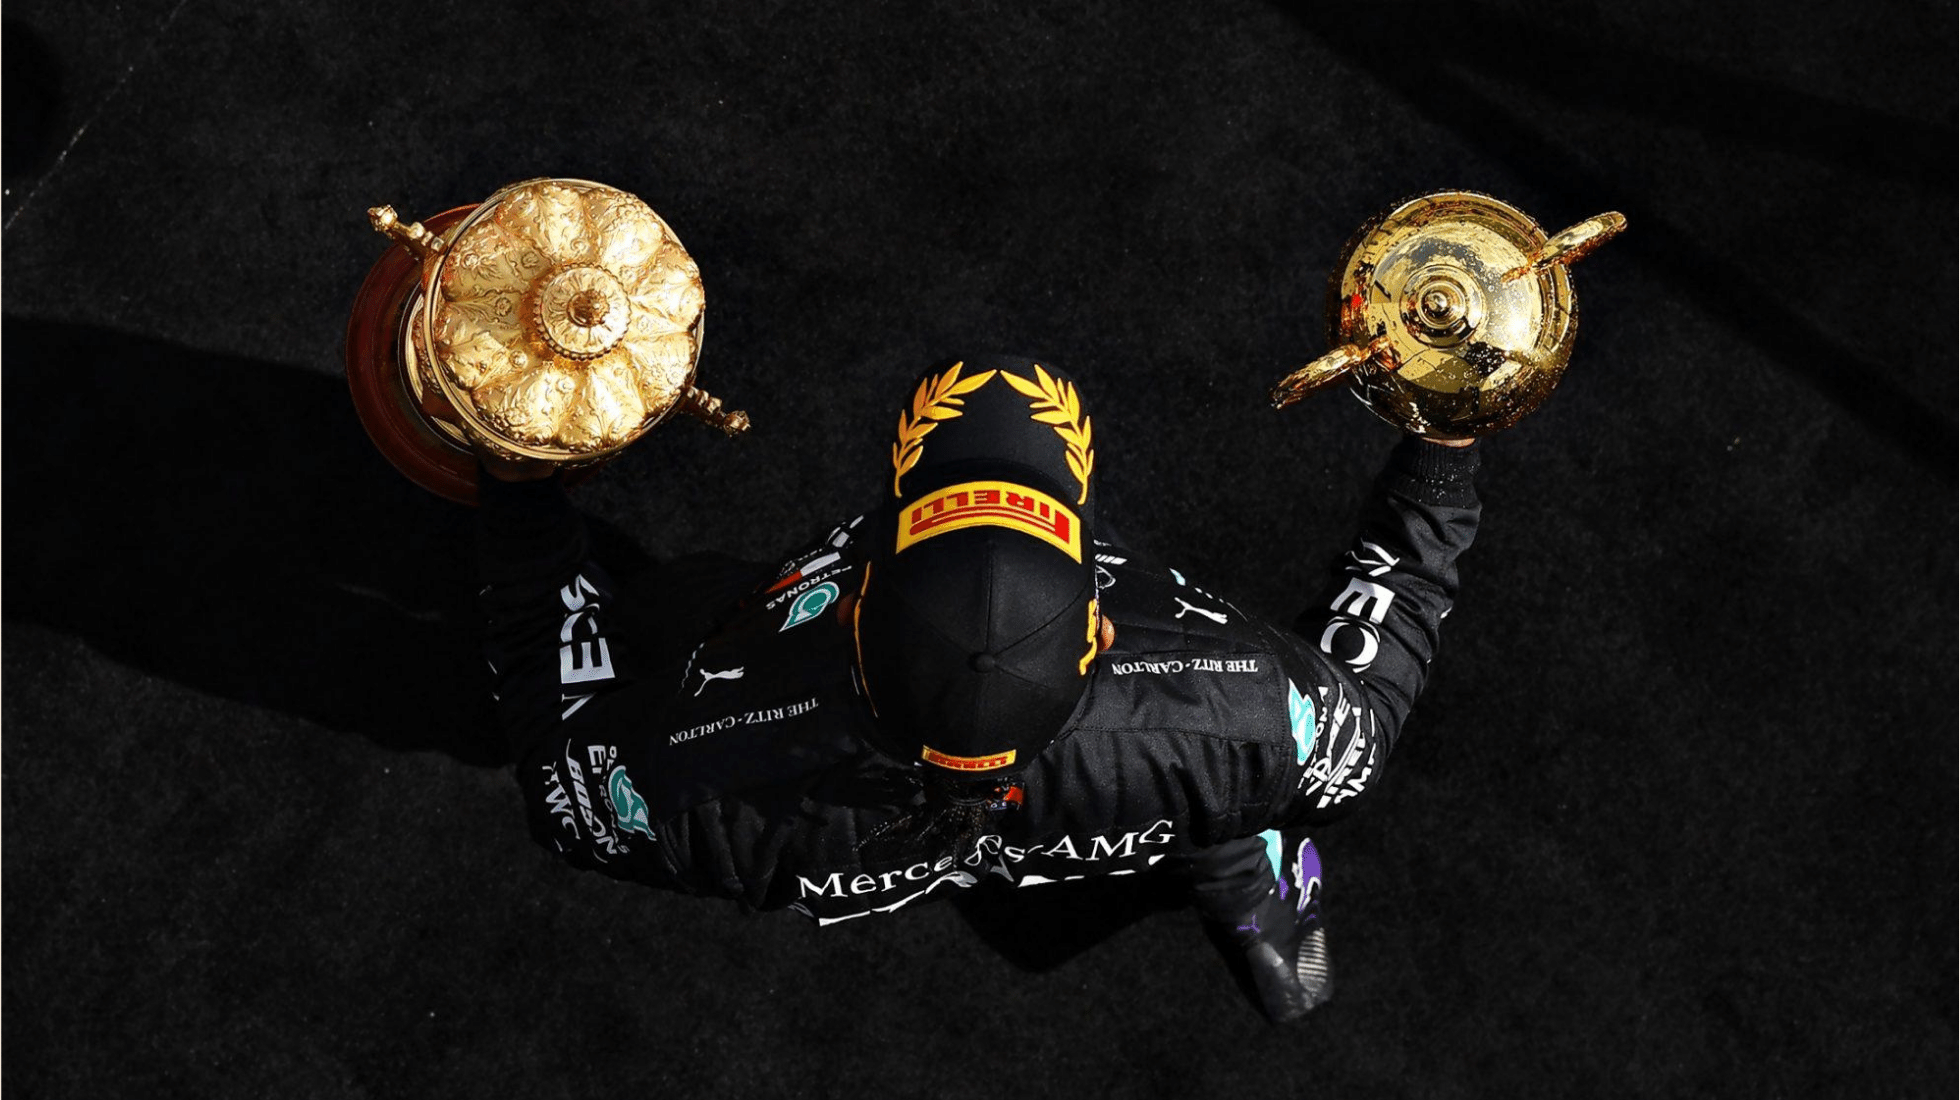 Hamilton wins his home GP on 3 Wheels